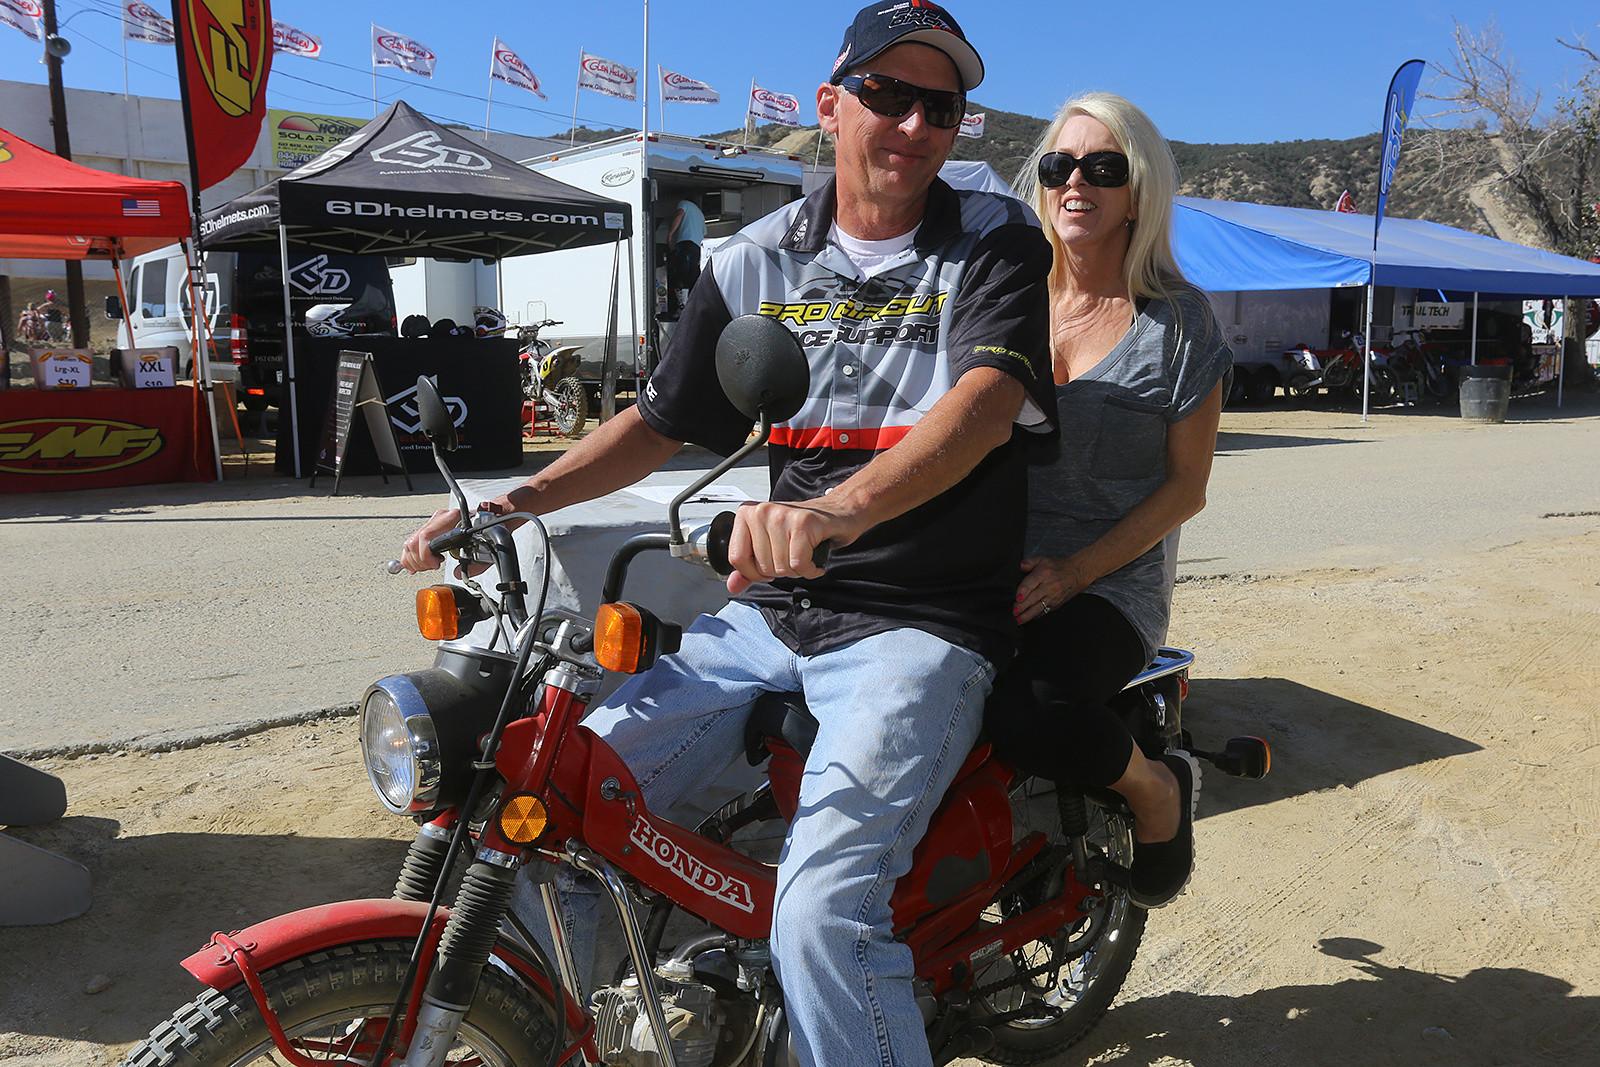 Bones with his wife, Debbie.